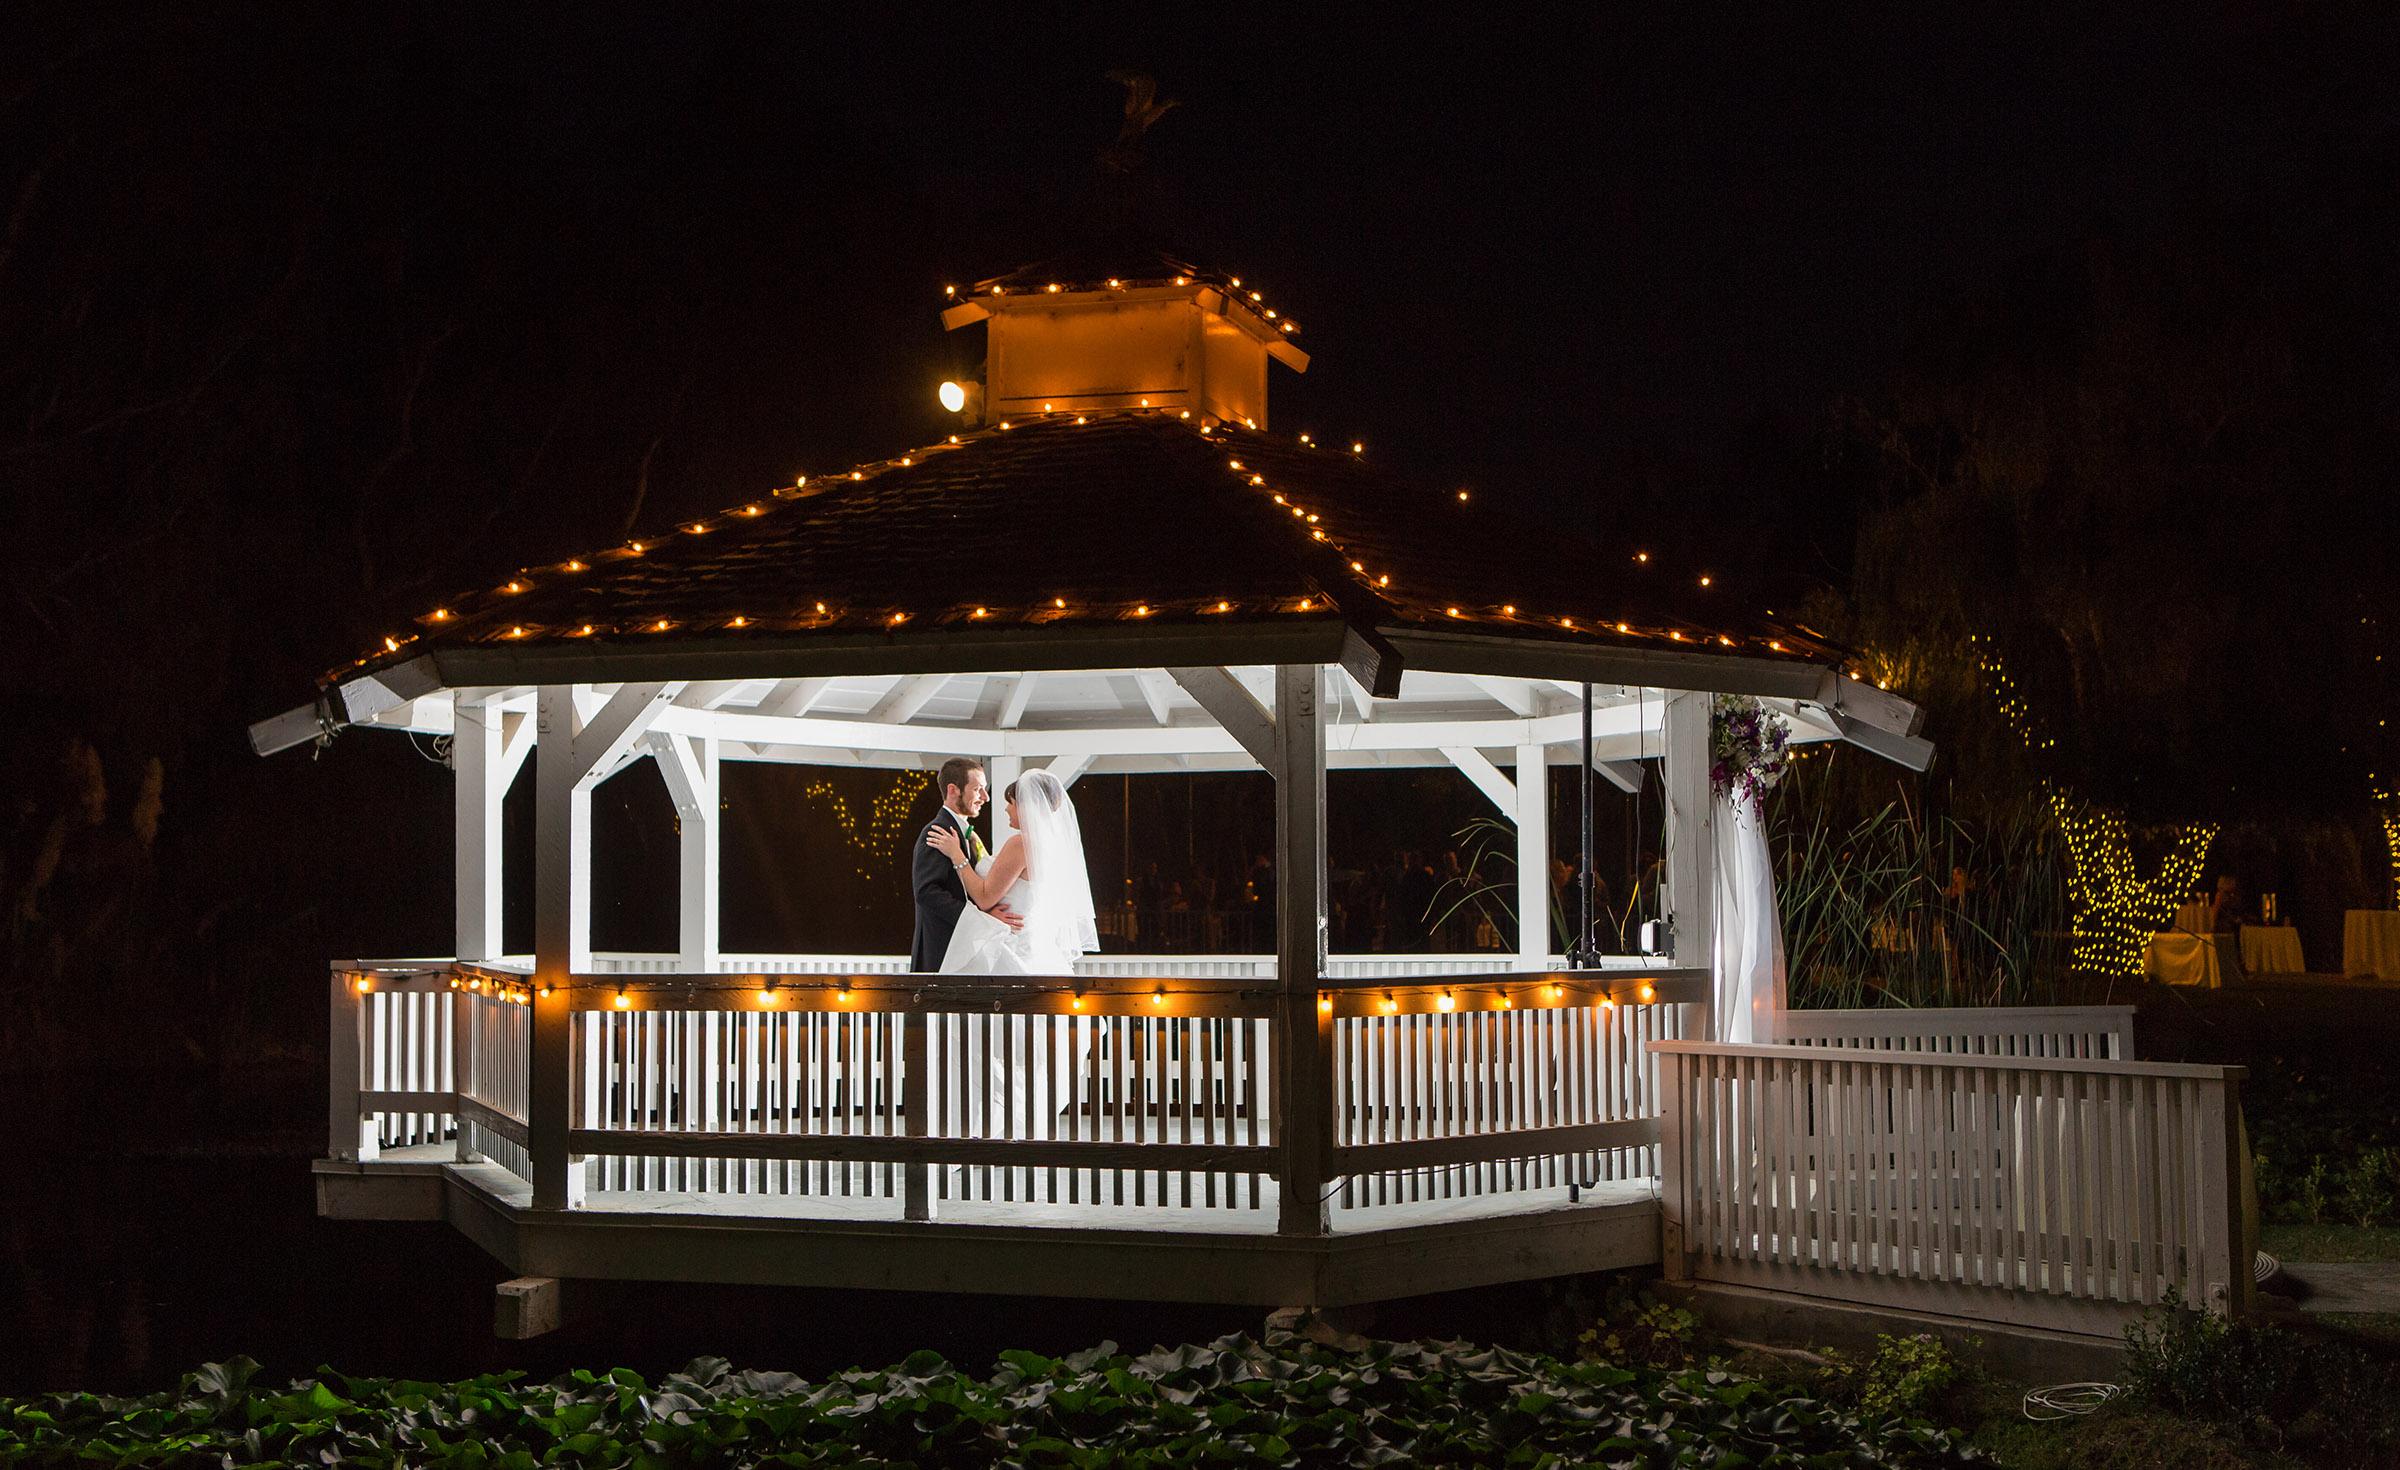 Gazebo at night - Orchard - Menifee, California - Riverside County - Wedgewood Weddings